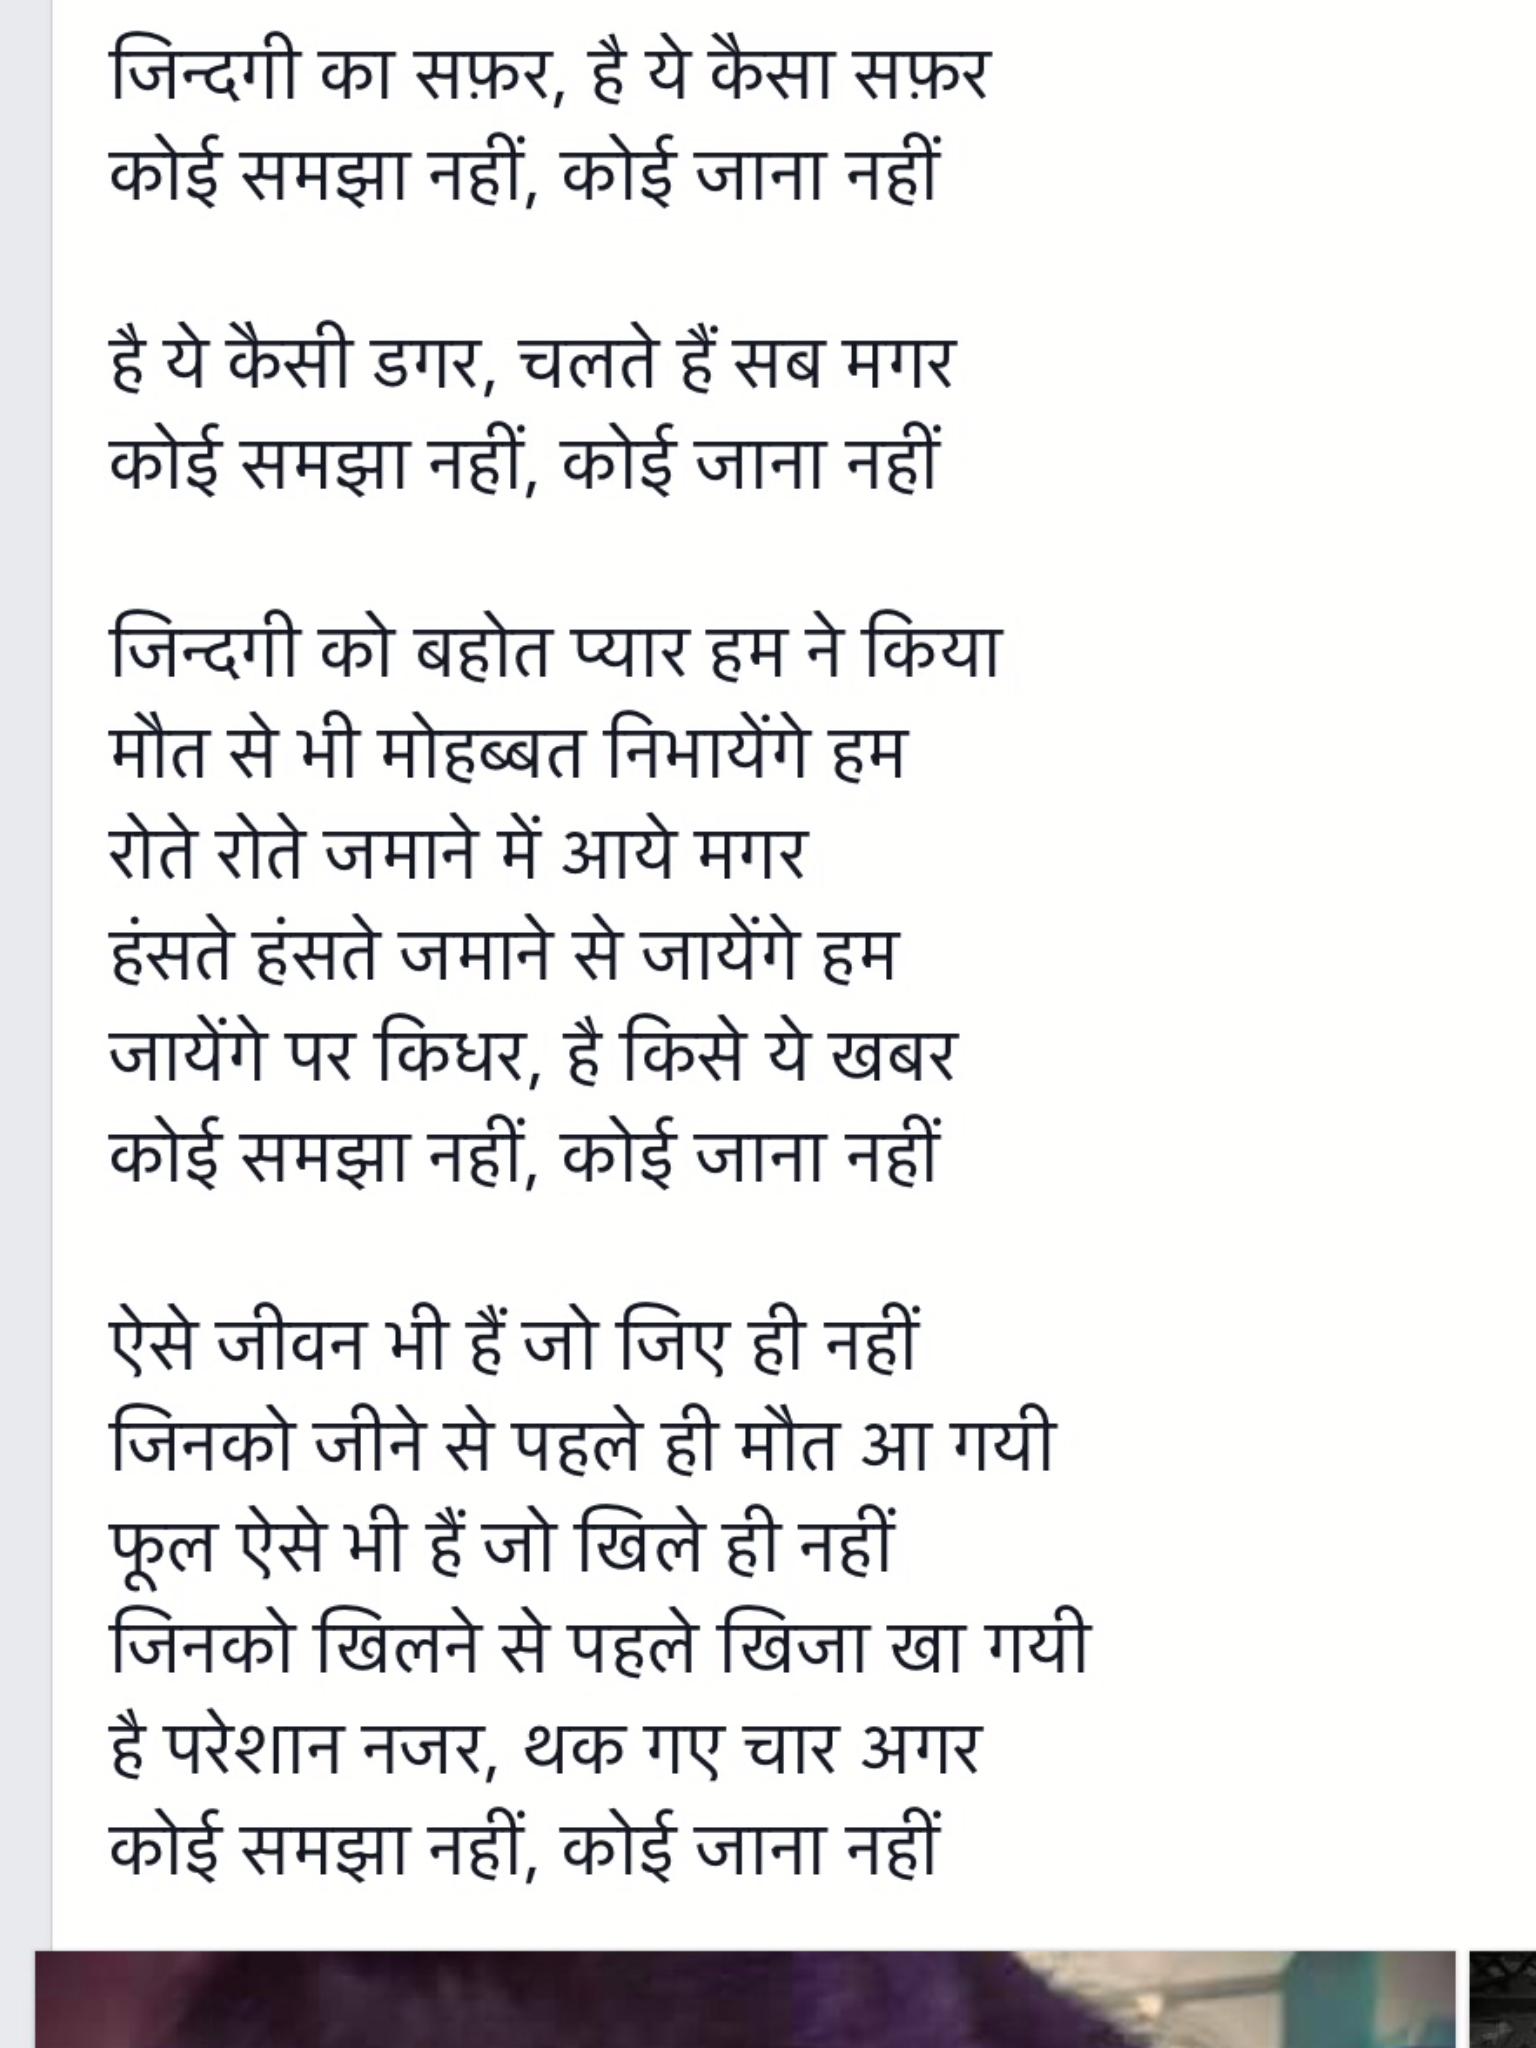 300 Hindi Songs And Lyrics Ideas Old Bollywood Songs Songs Lyrics Bollywood entertainment at its best. 300 hindi songs and lyrics ideas